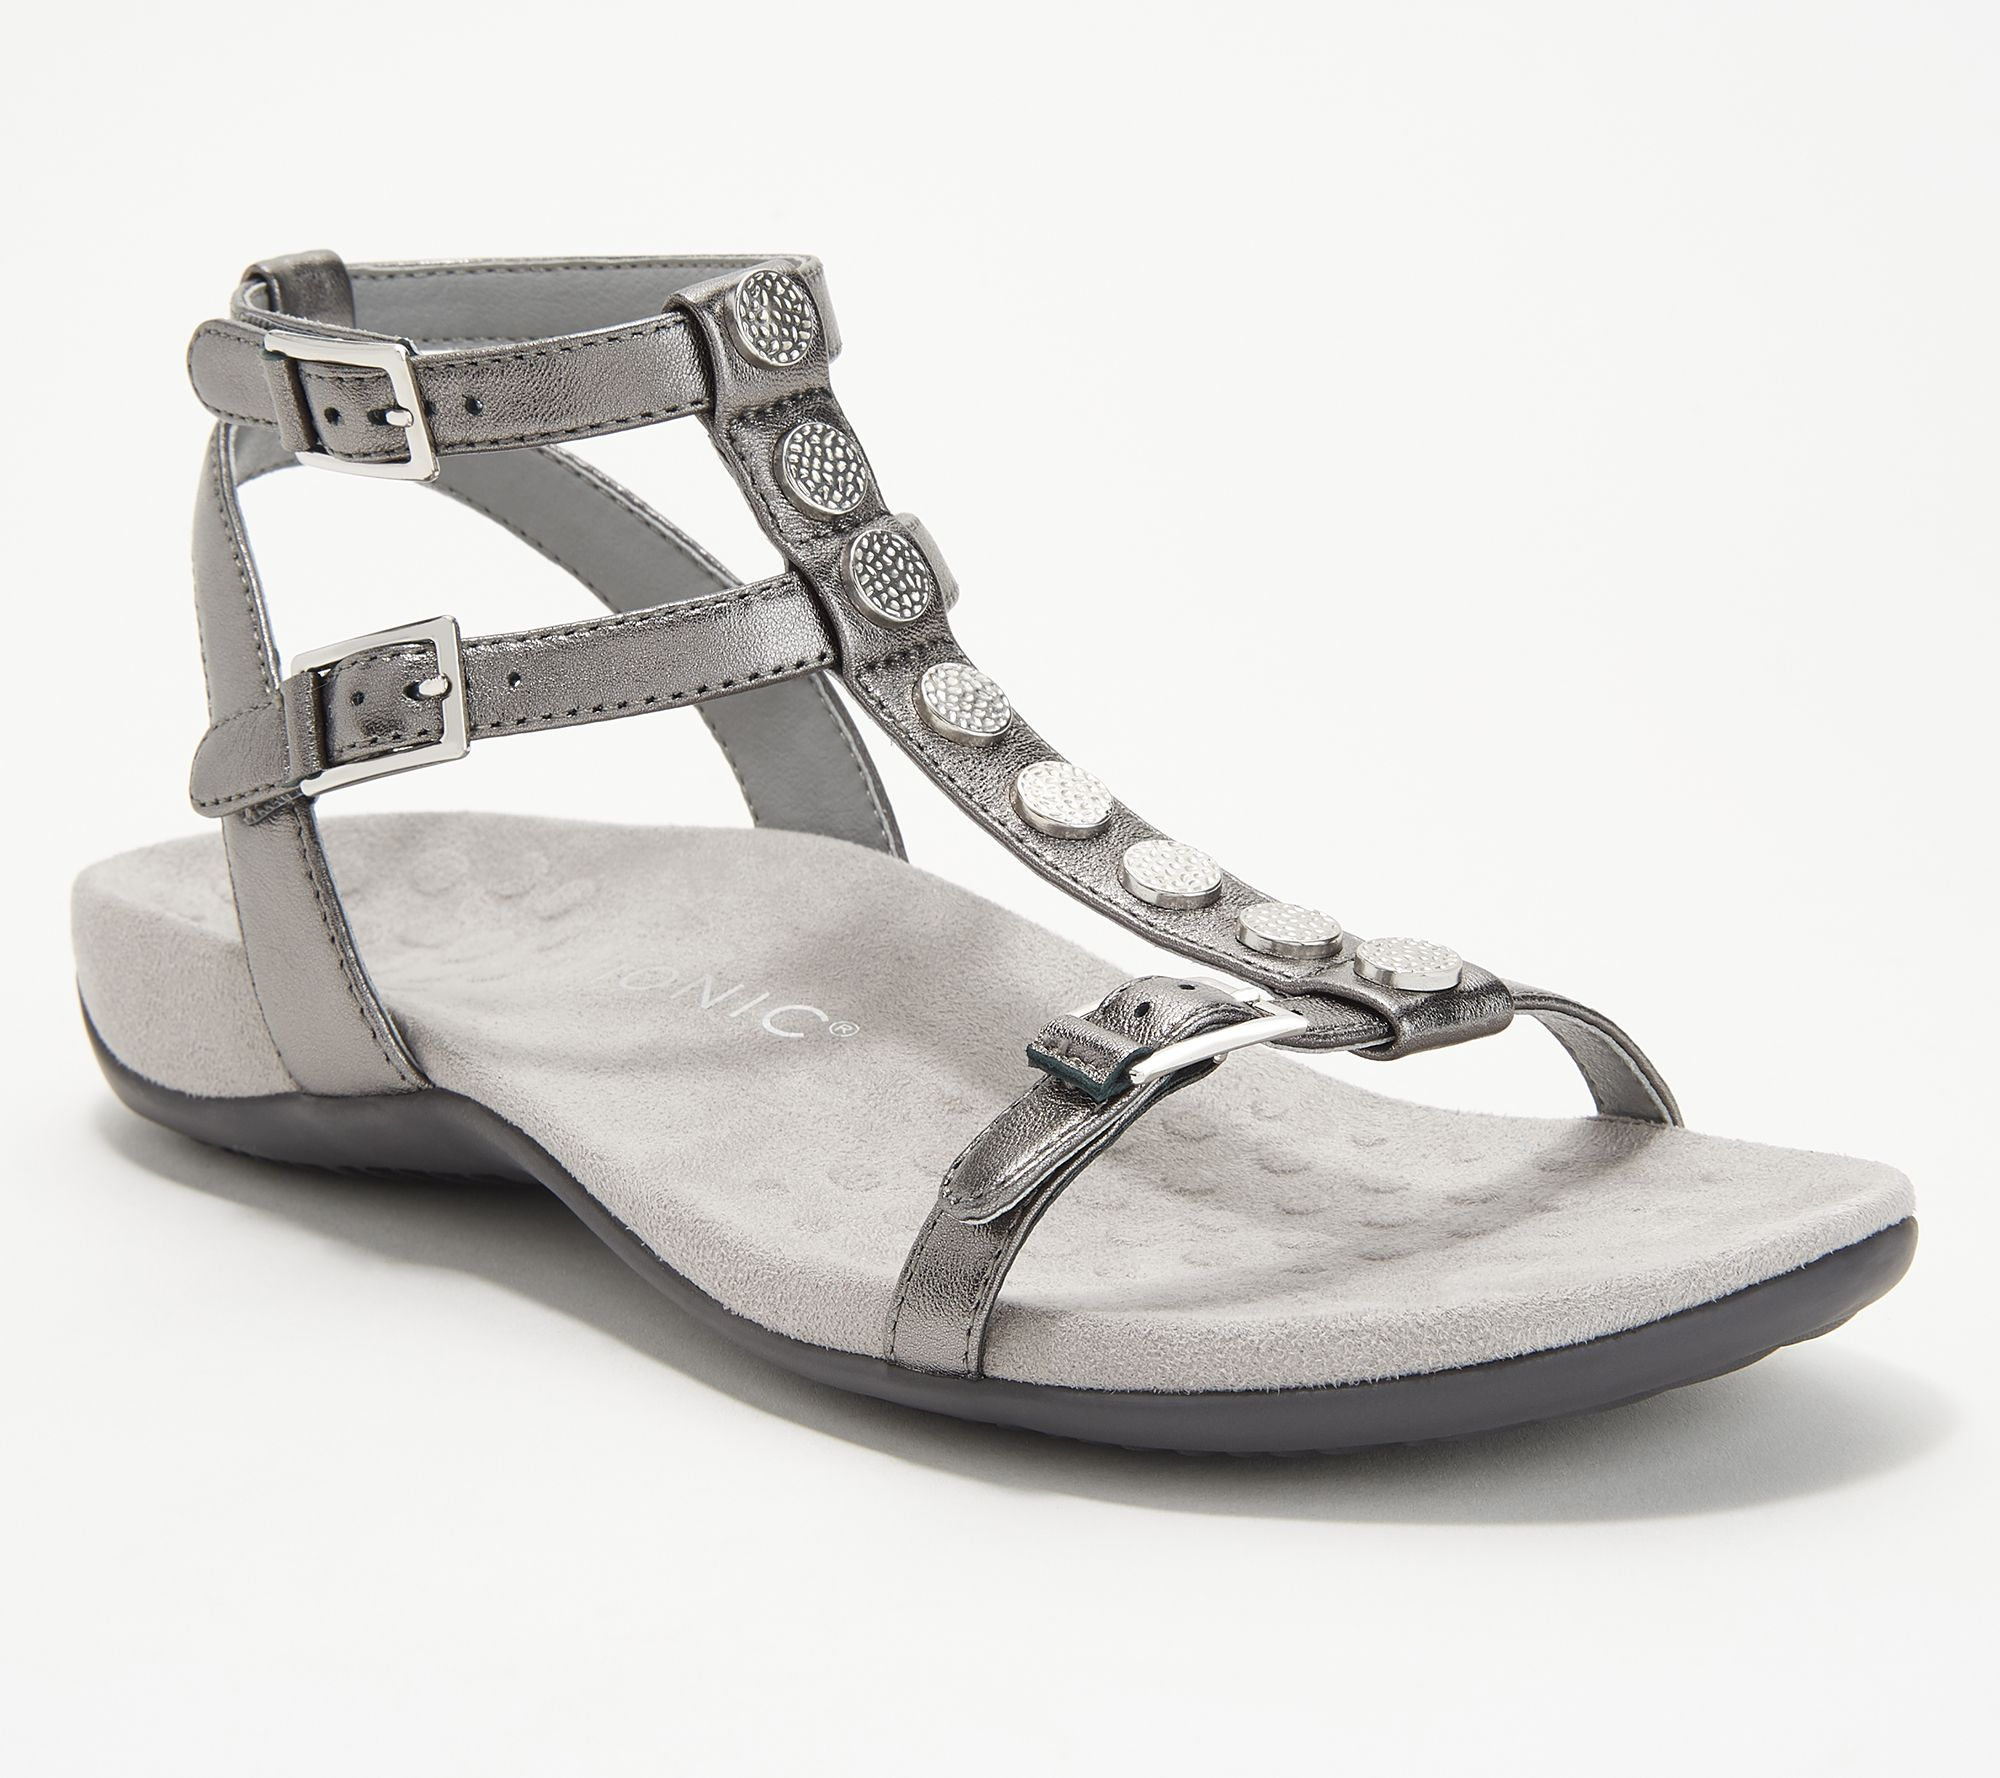 1176bdaef70e Vionic Leather Multi-Strap Sandals - Hailey - Page 1 — QVC.com